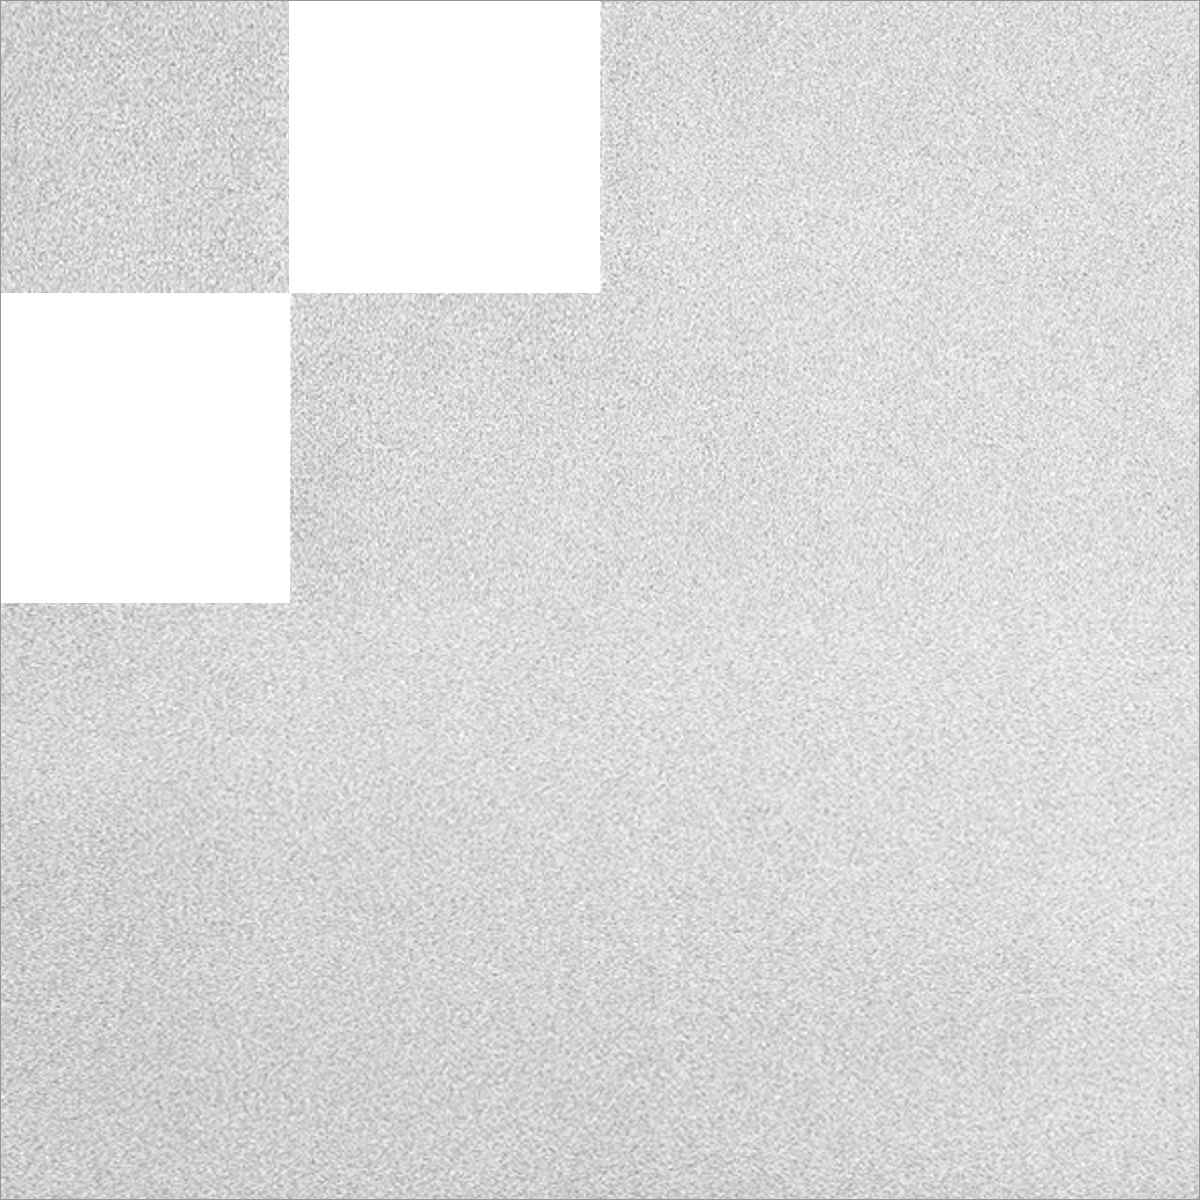 Minimal Space 03 by M. Grégoire MURITH - Masterpiece Online